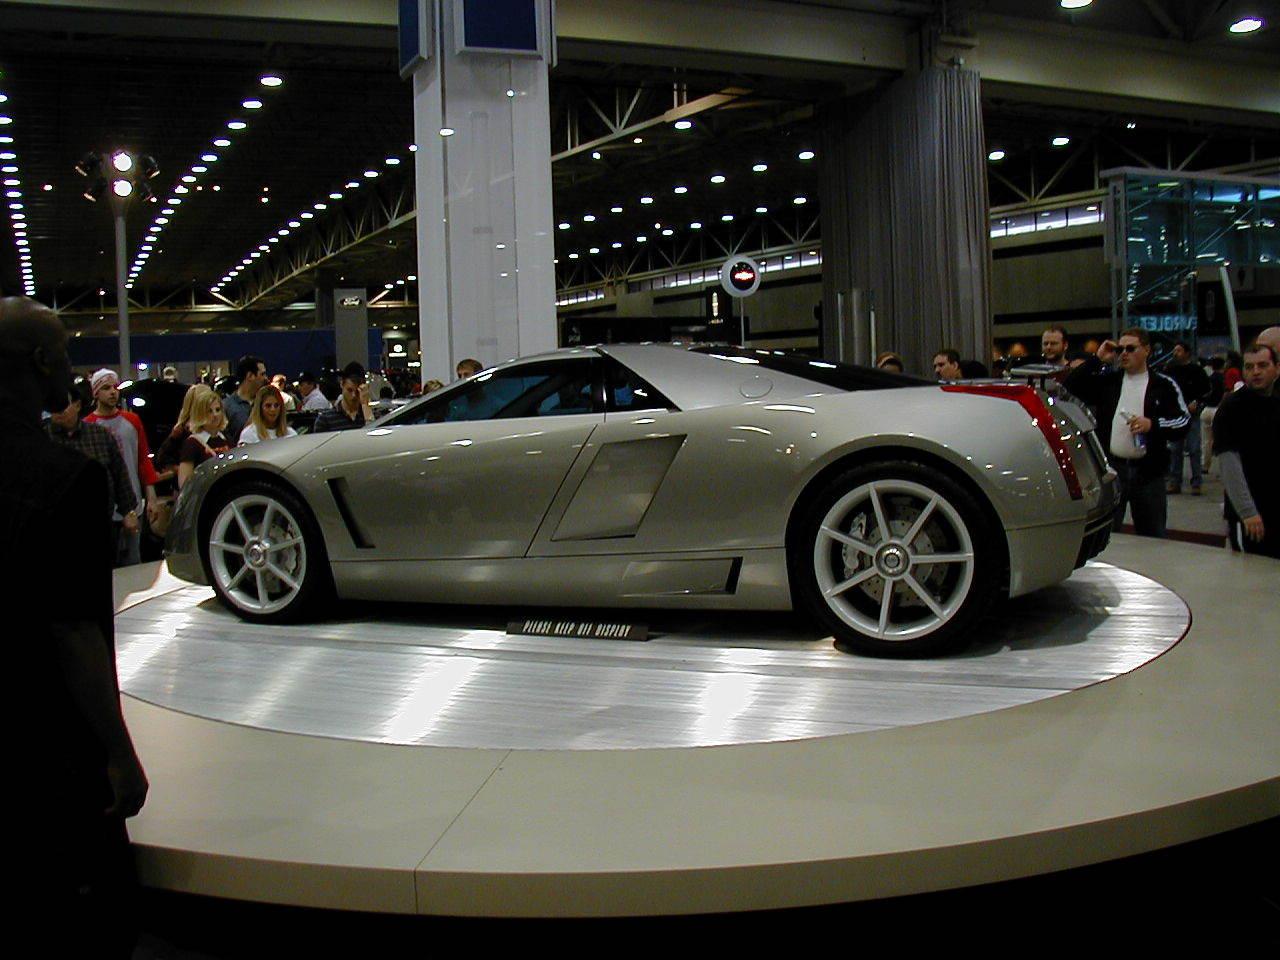 2021 Cadillac XLR - Page 3 - CorvetteForum - Chevrolet ...